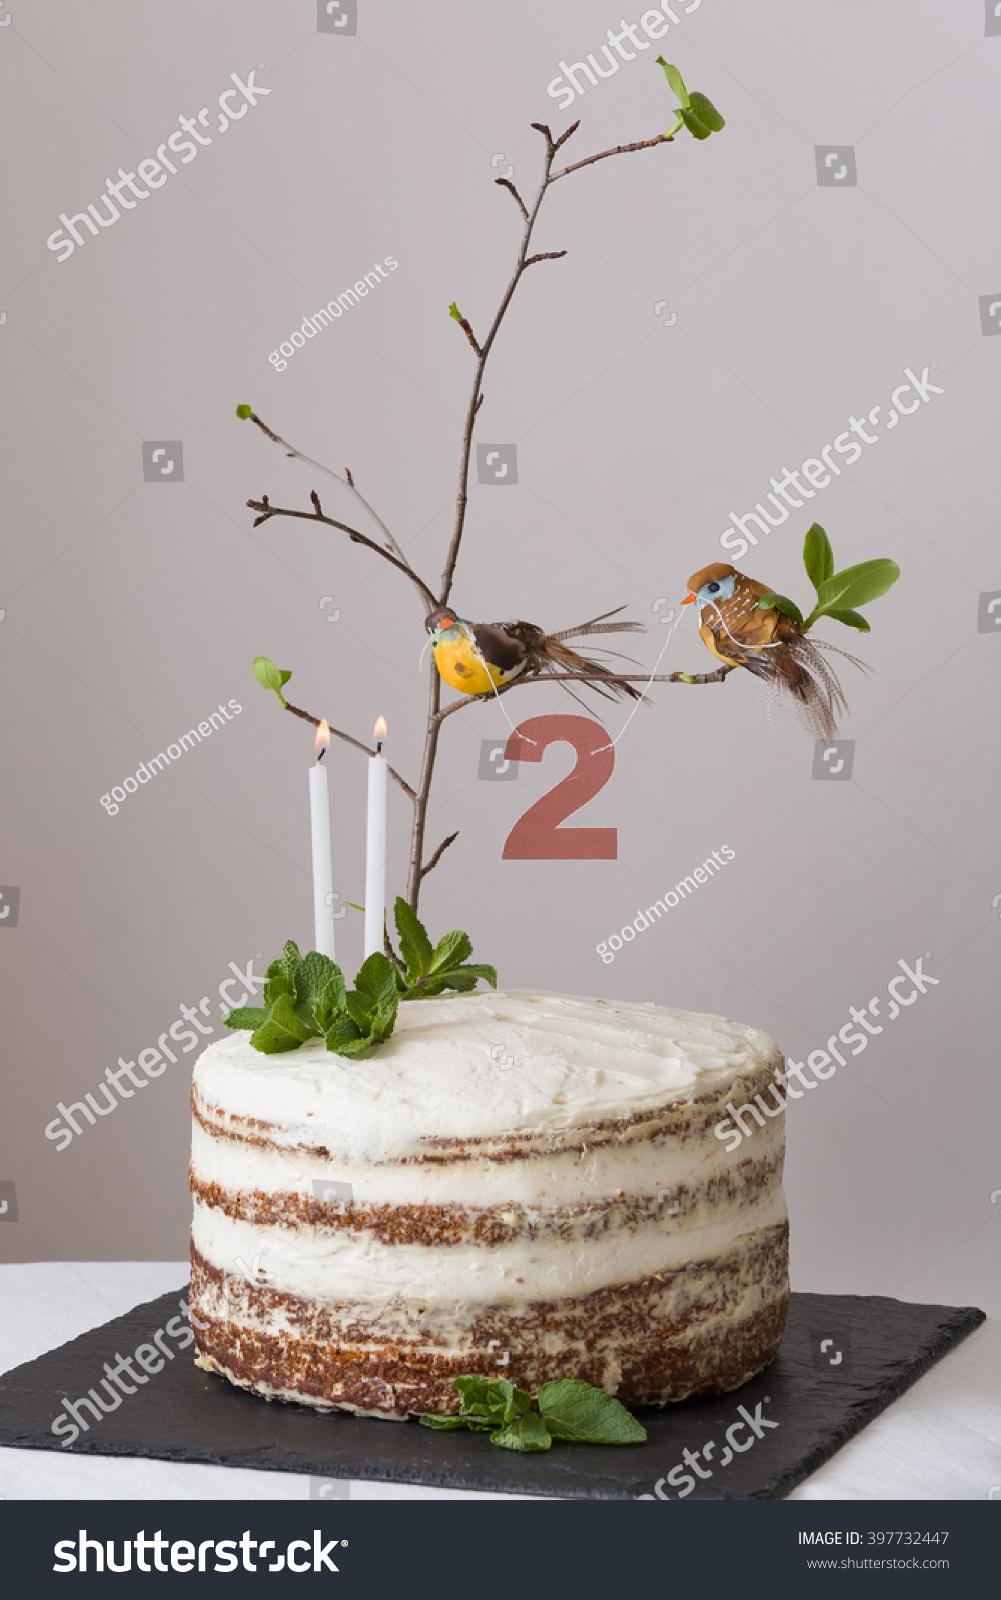 Delicious Birthday Cake Branch Tree Birds Stock Photo (100% Legal ...